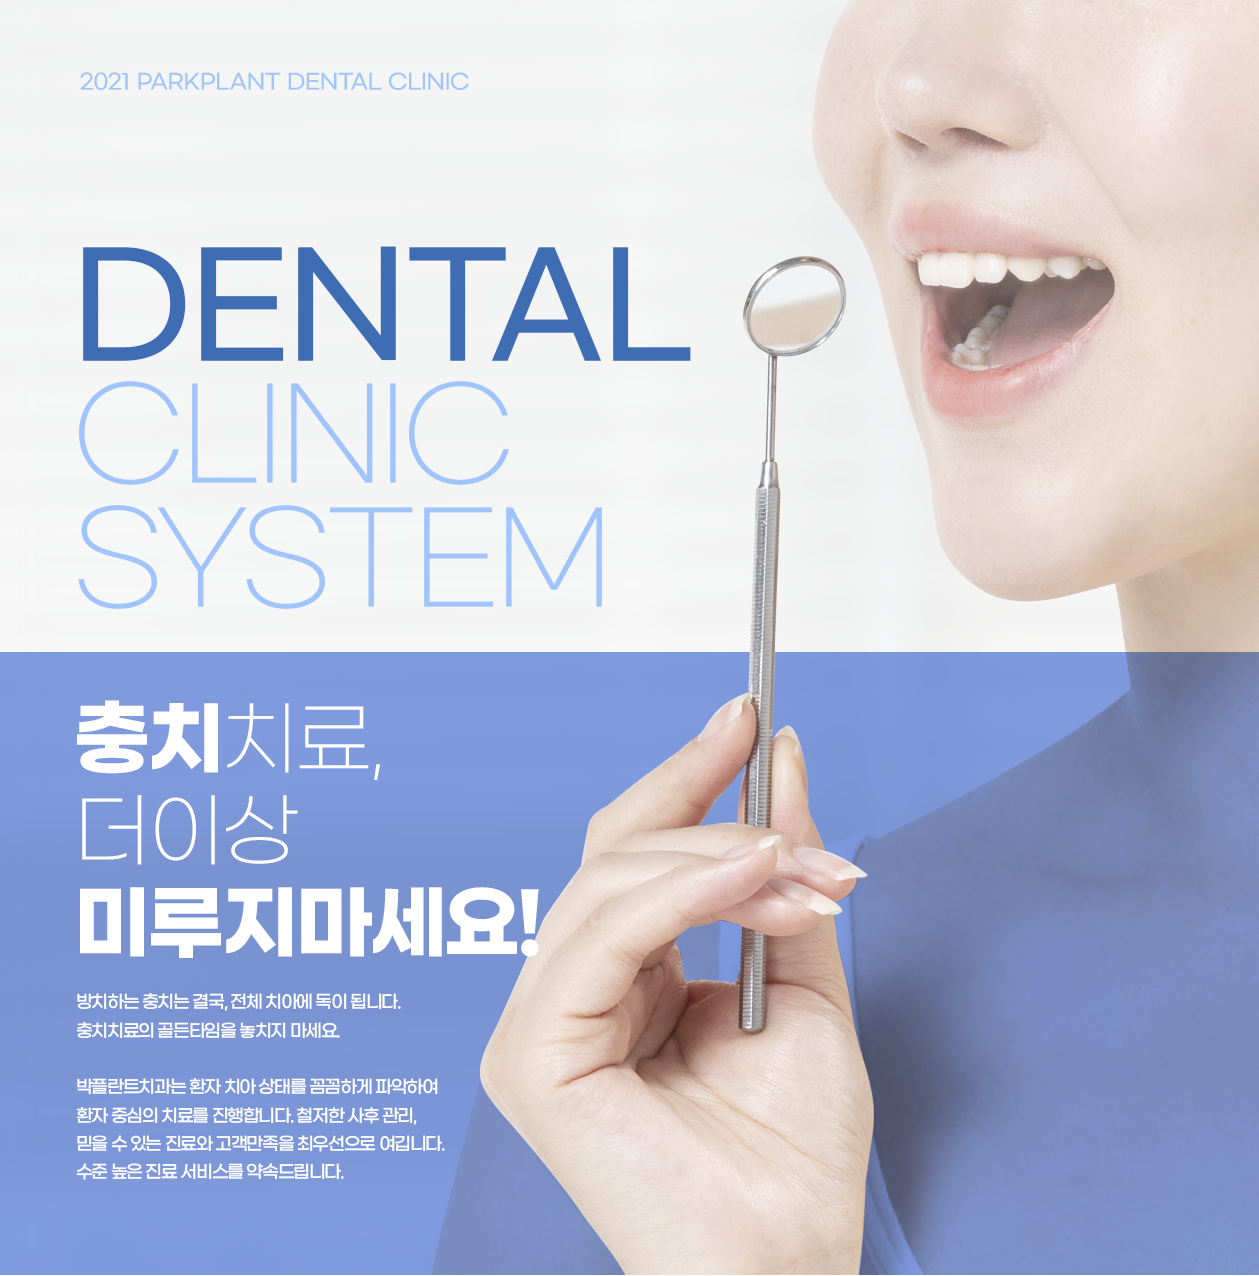 DENTAL CLINIC SYSTEM